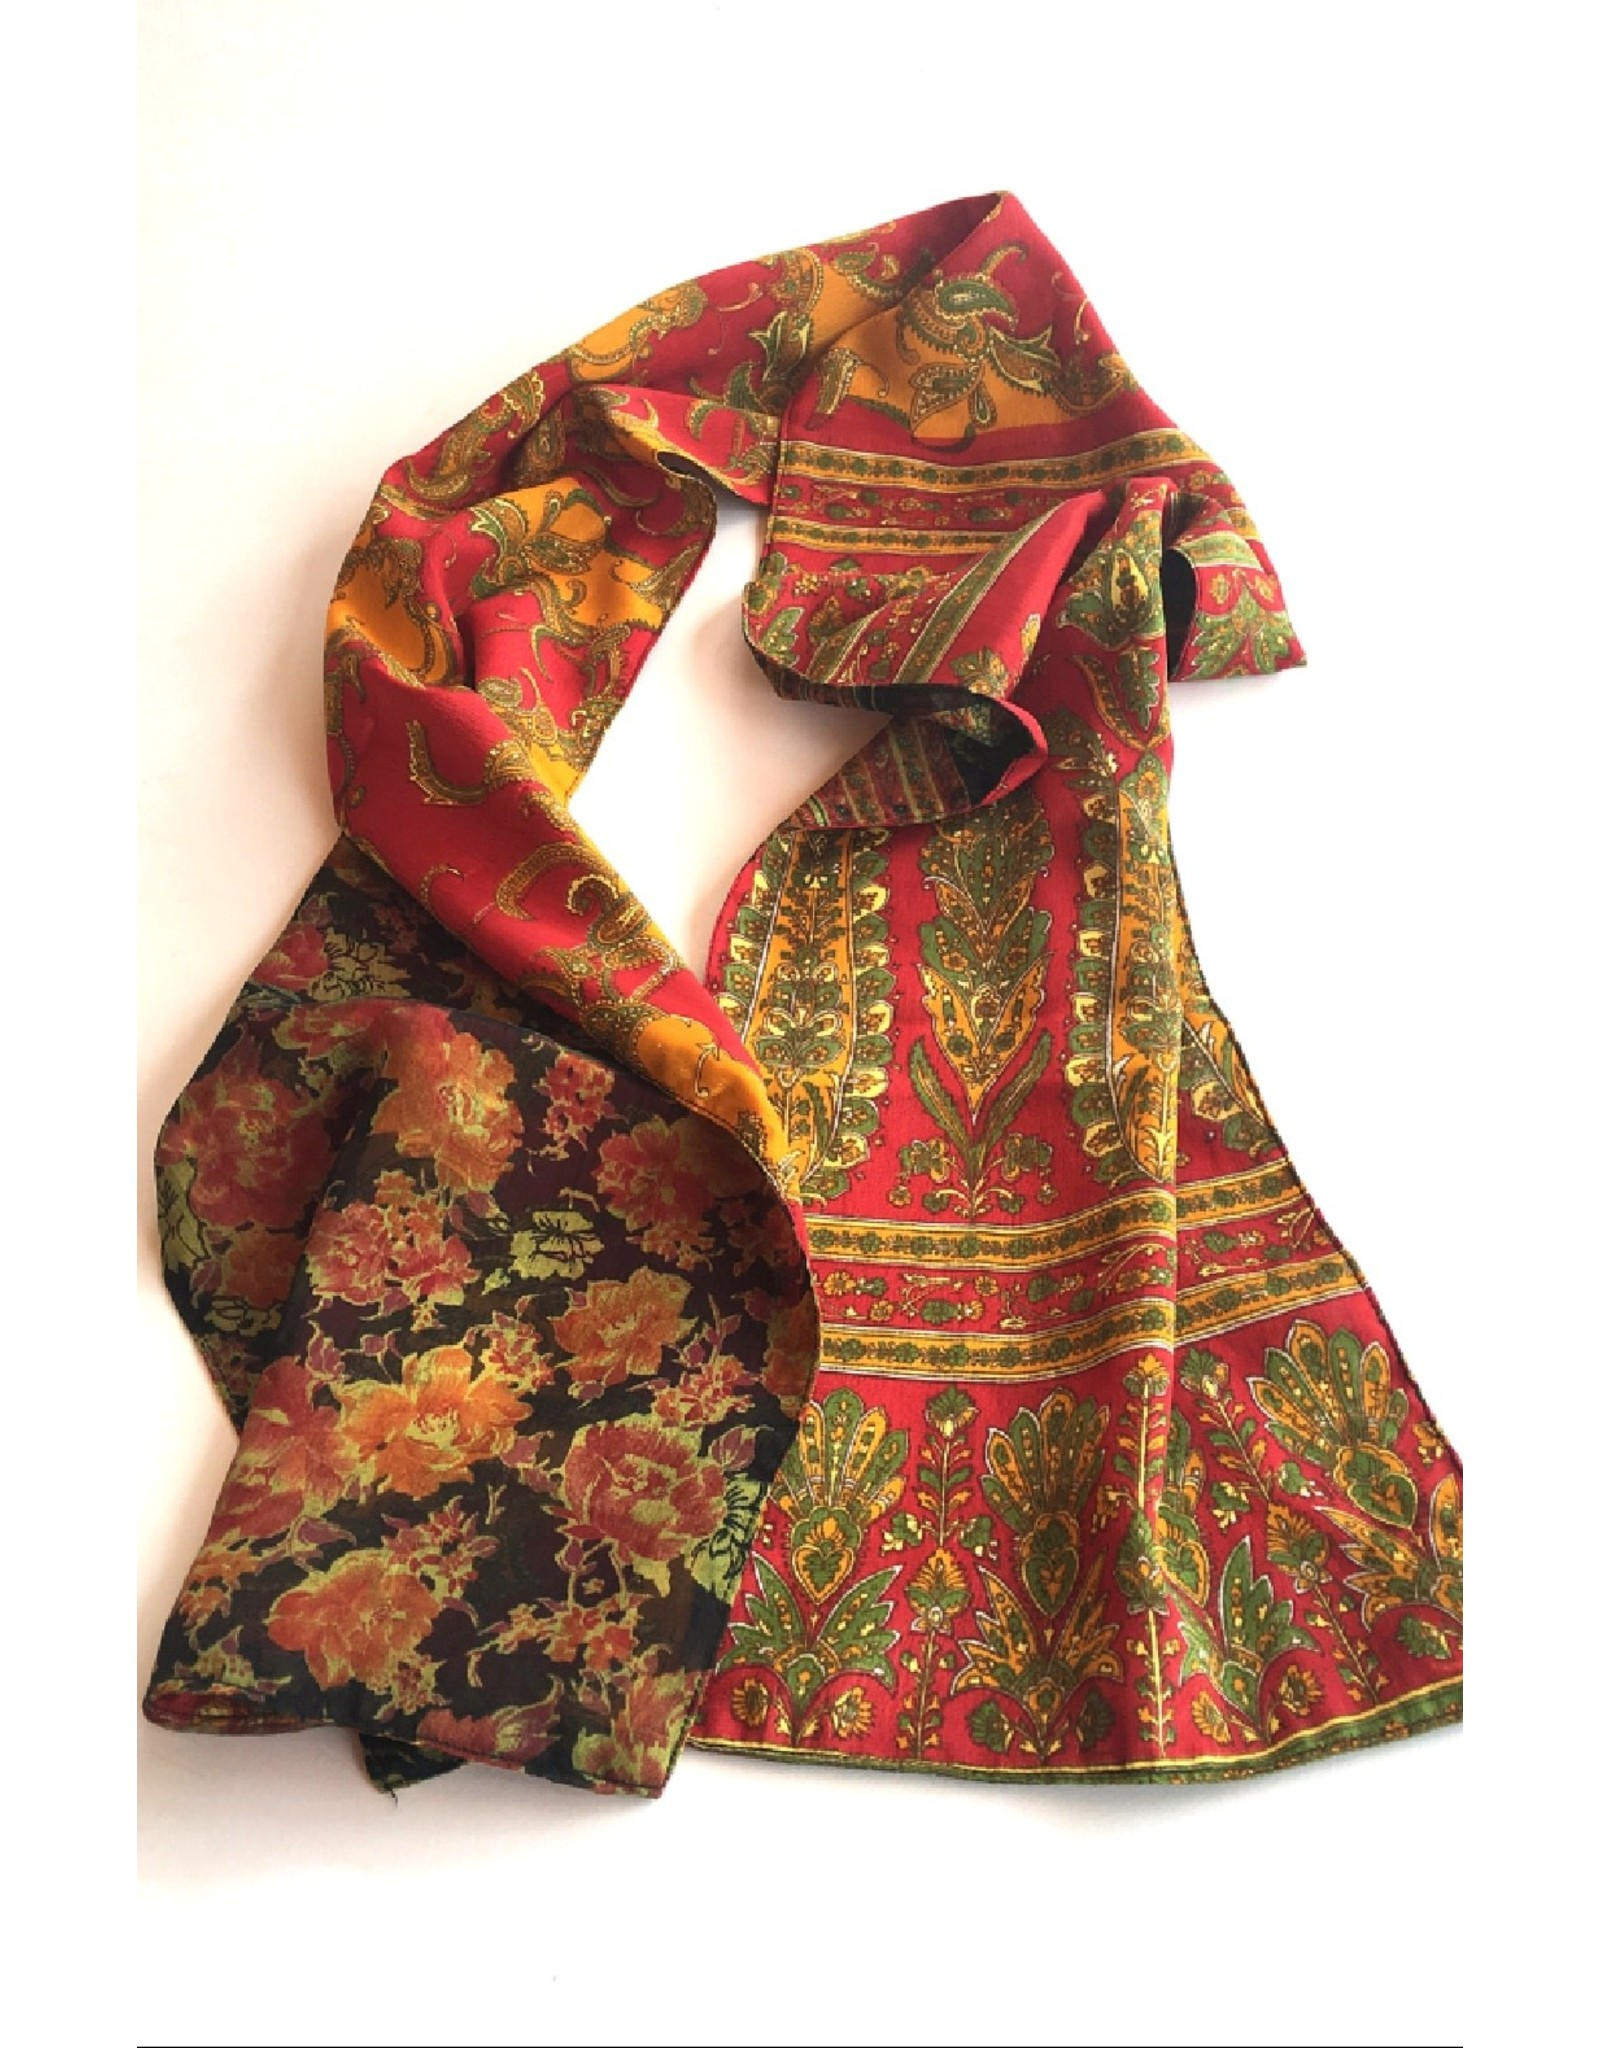 Reversible Double Sided Silk Sari Scarf, Nepal